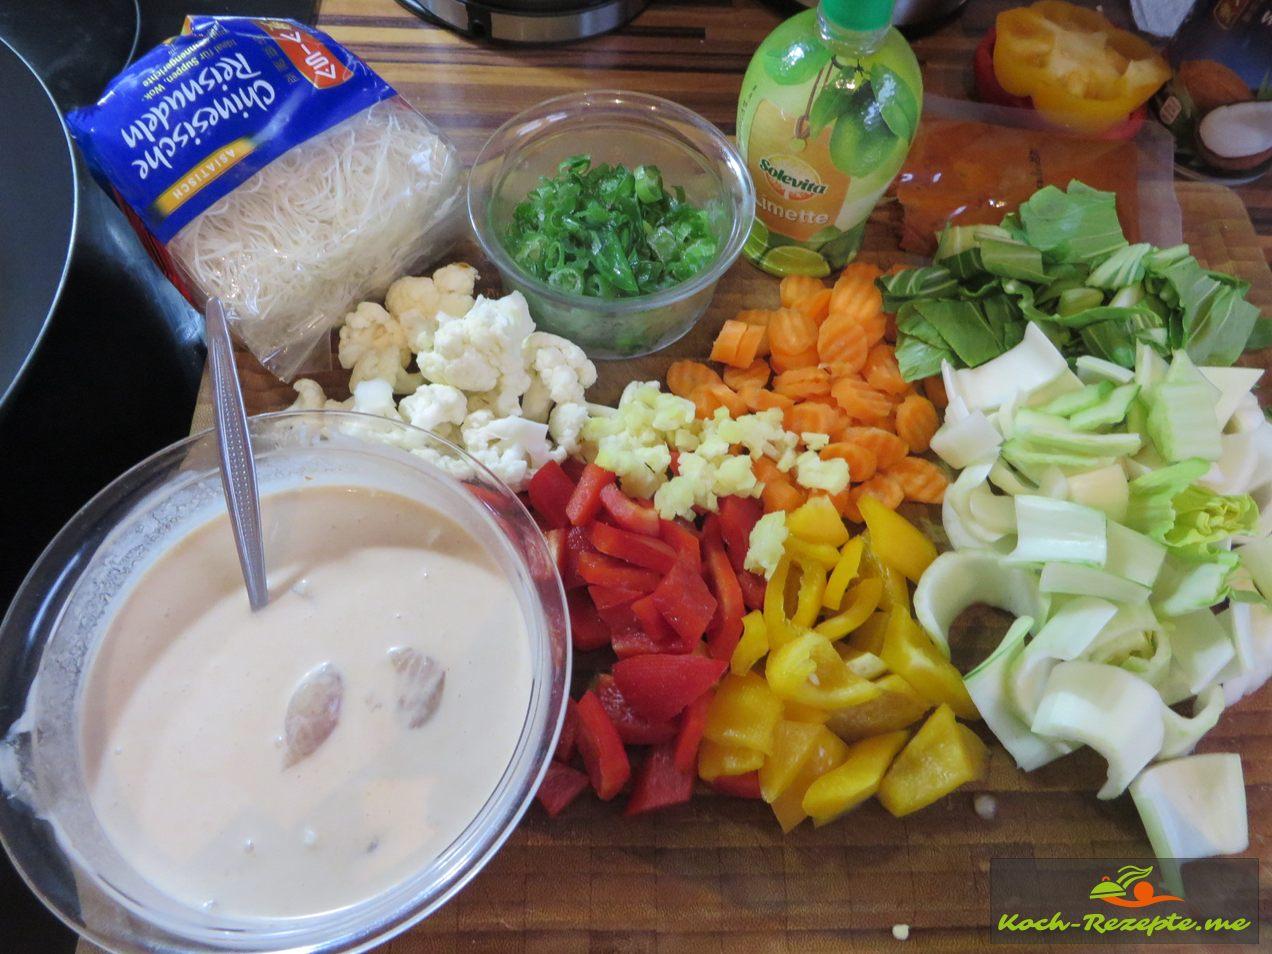 Zutaten:Kokosmilch,Hähnchenfilet,Paprika,Ingwer, Chili, Frühlingszwiebel,Pak Choi, Möhren,Blumenkohl,Limettensaft